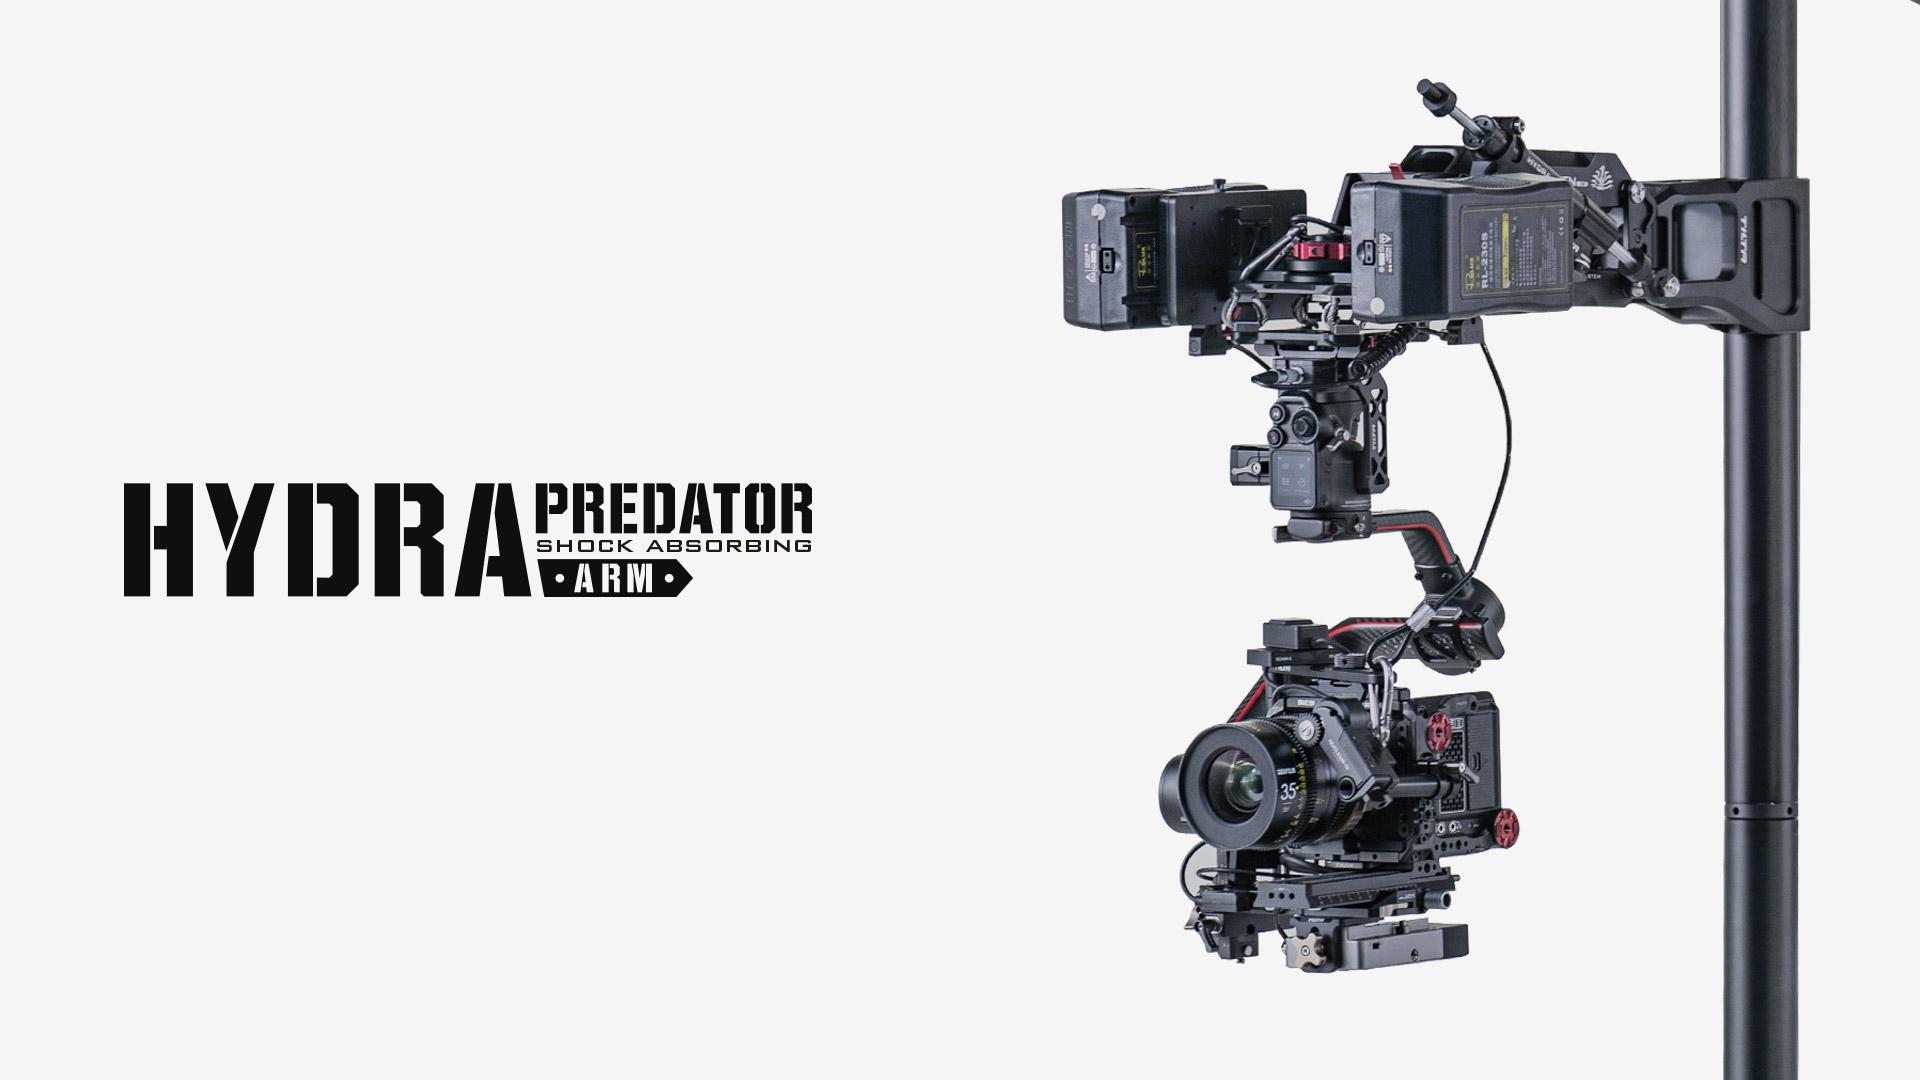 hydra predator shock absorbing arm